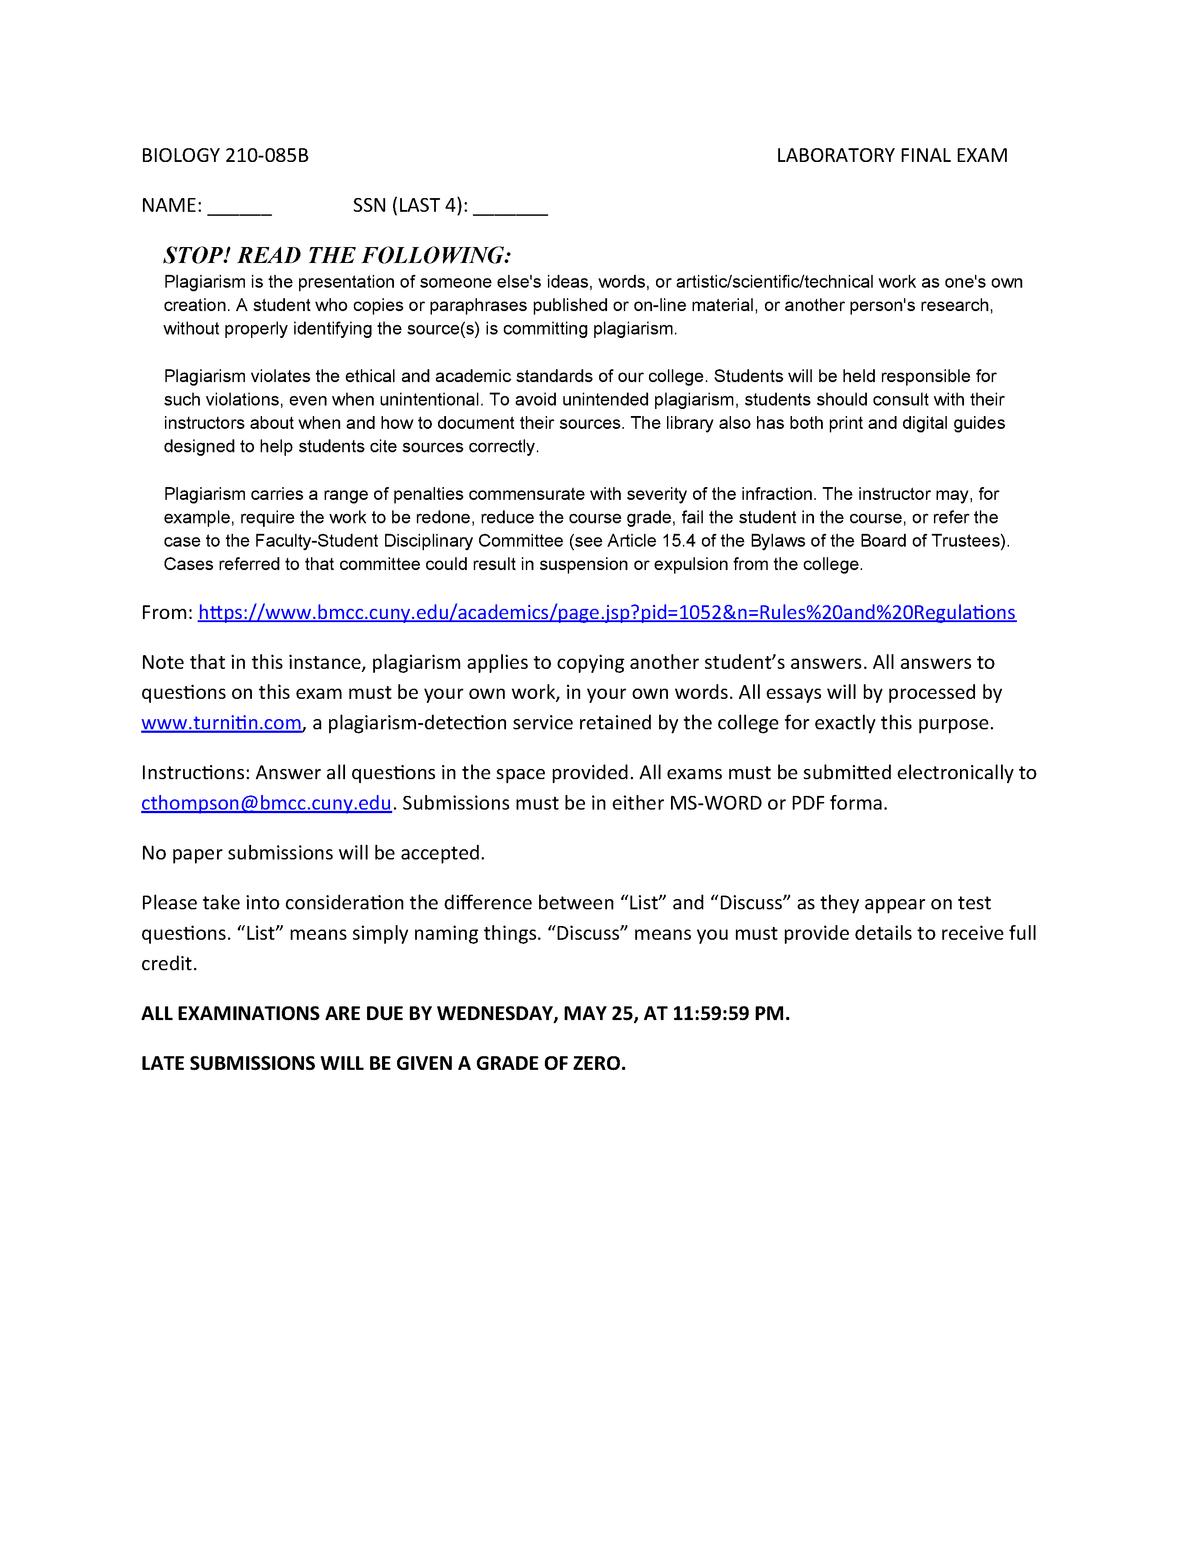 BIO 210 Lab Final__Professor Thompson - BIO 210 Biology I